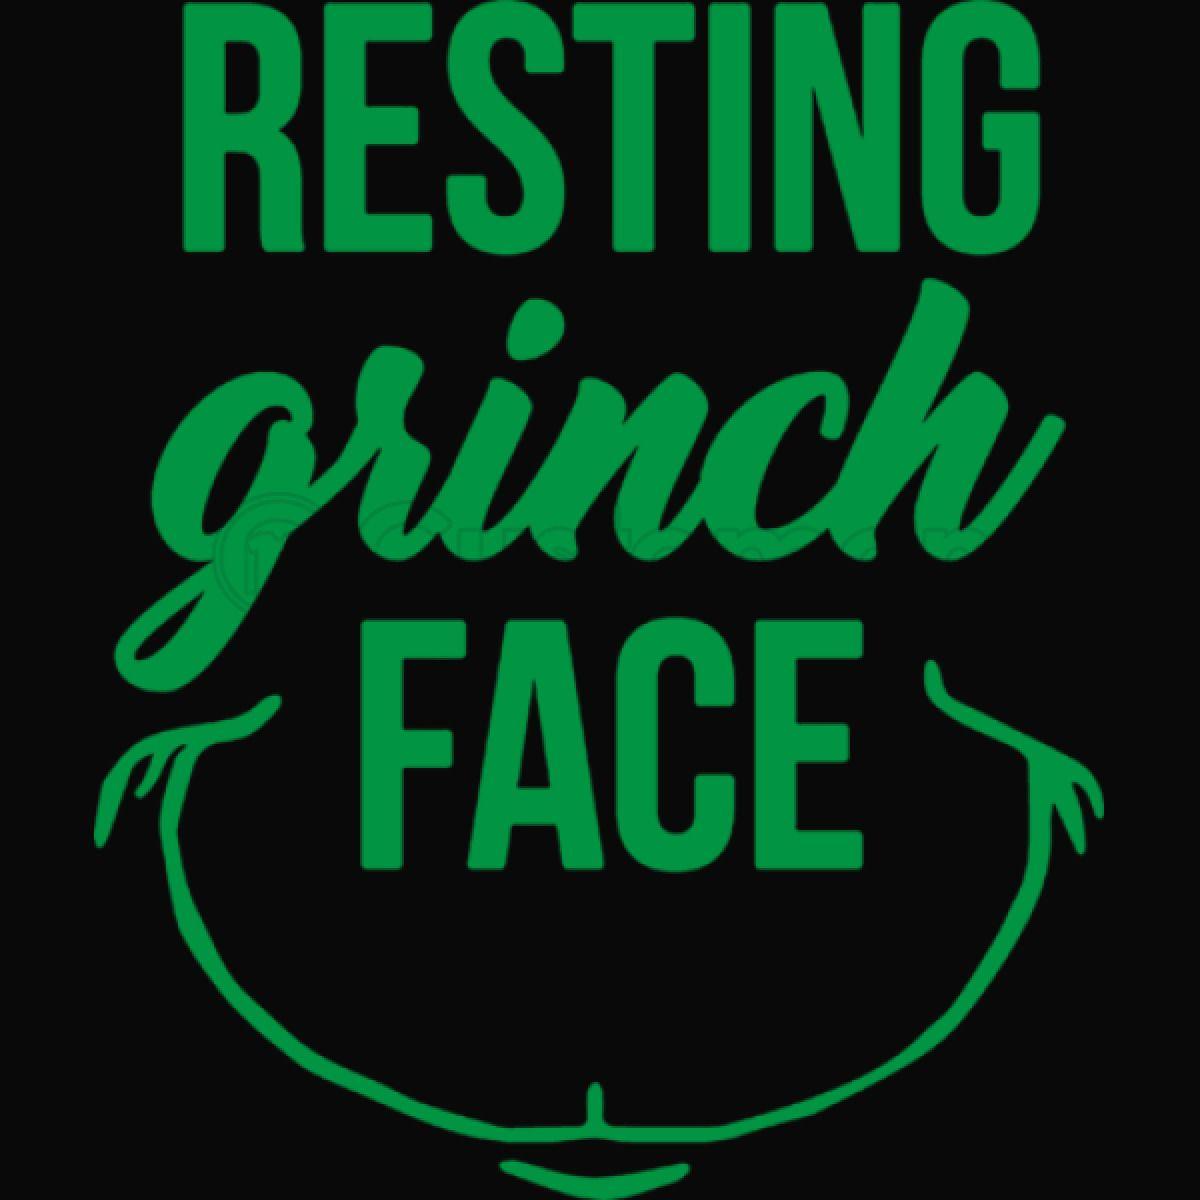 resting grinch face Unisex Zip-Up Hoodie - Customon